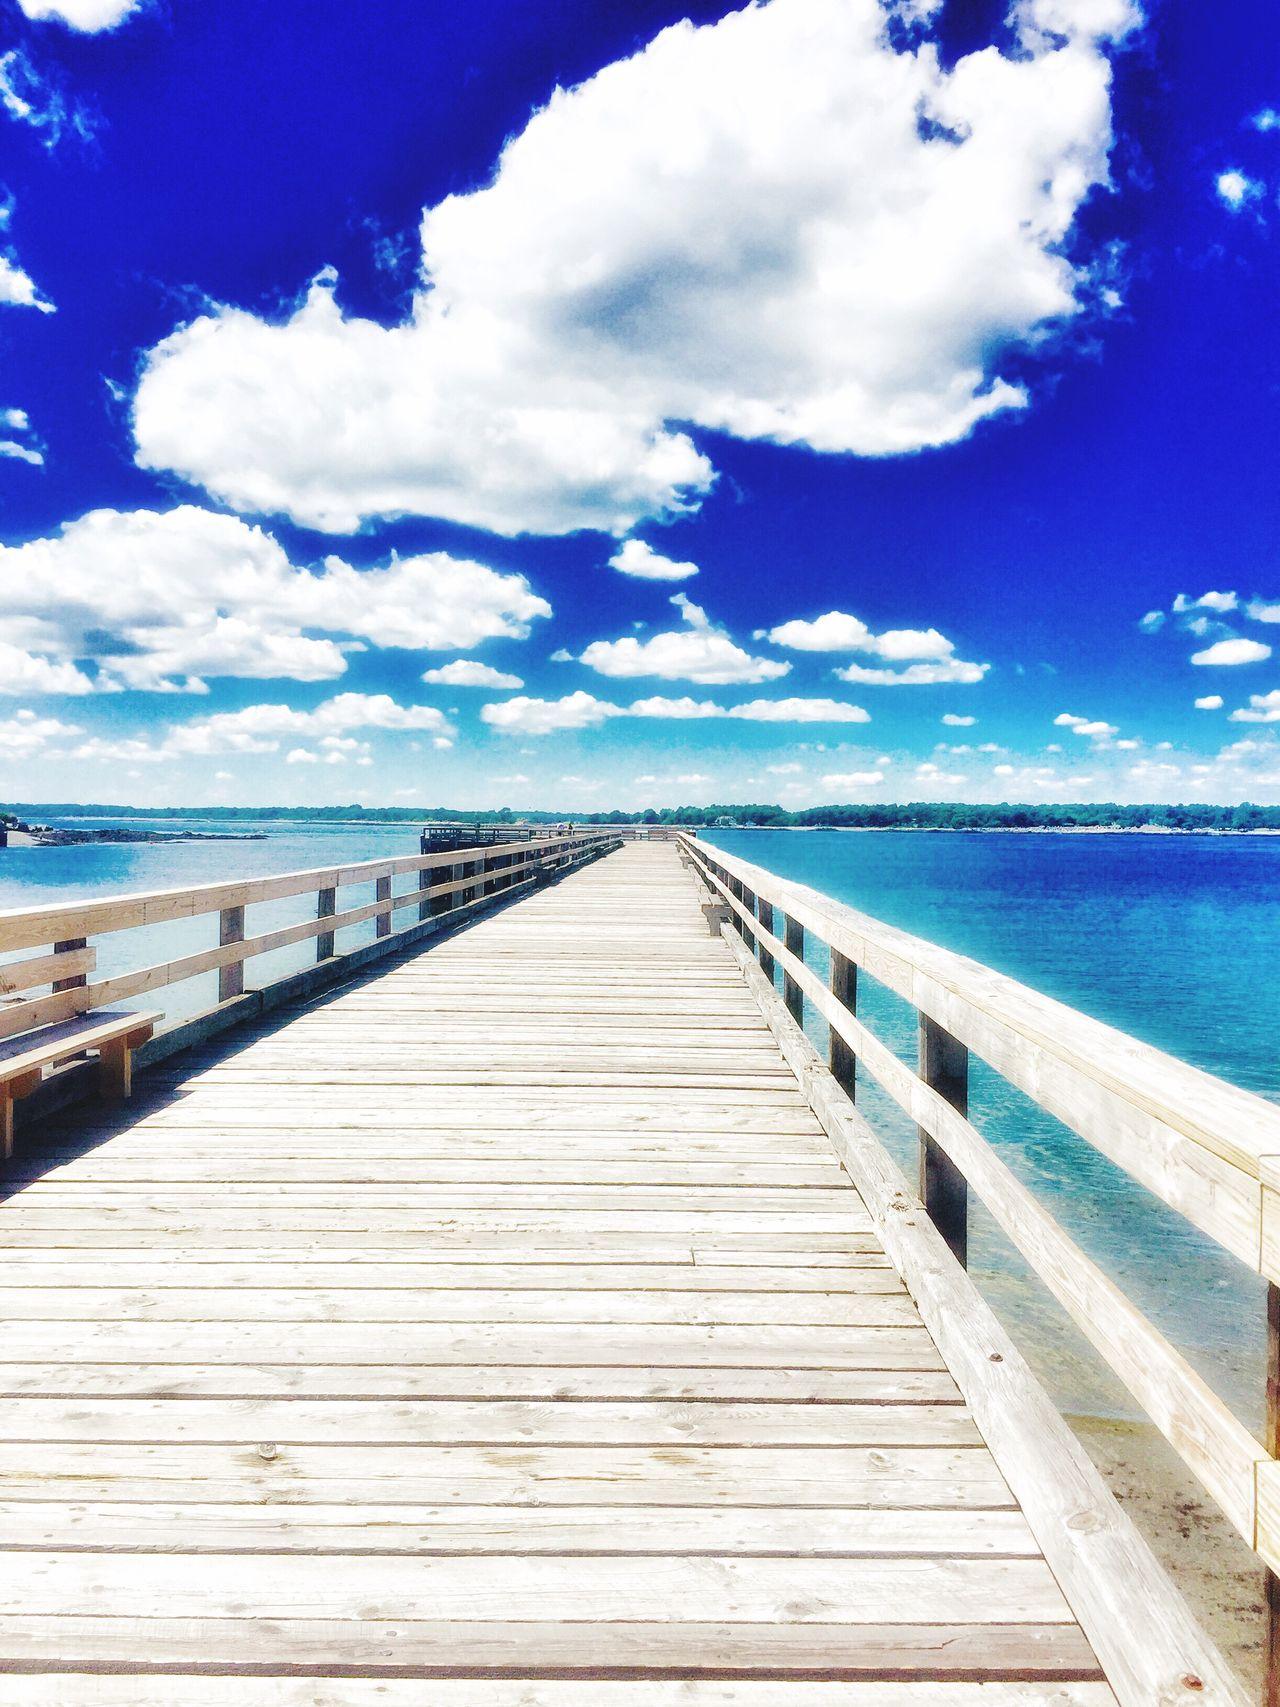 Wooden Pier over the ocean water at fort Foster beach in Kittery, ME Wooden Bridge wooden pier, daylight, sunlight, White Clouds Wooden Pier Sunlight ☀ Daylight Bright Blue Sky East Coast